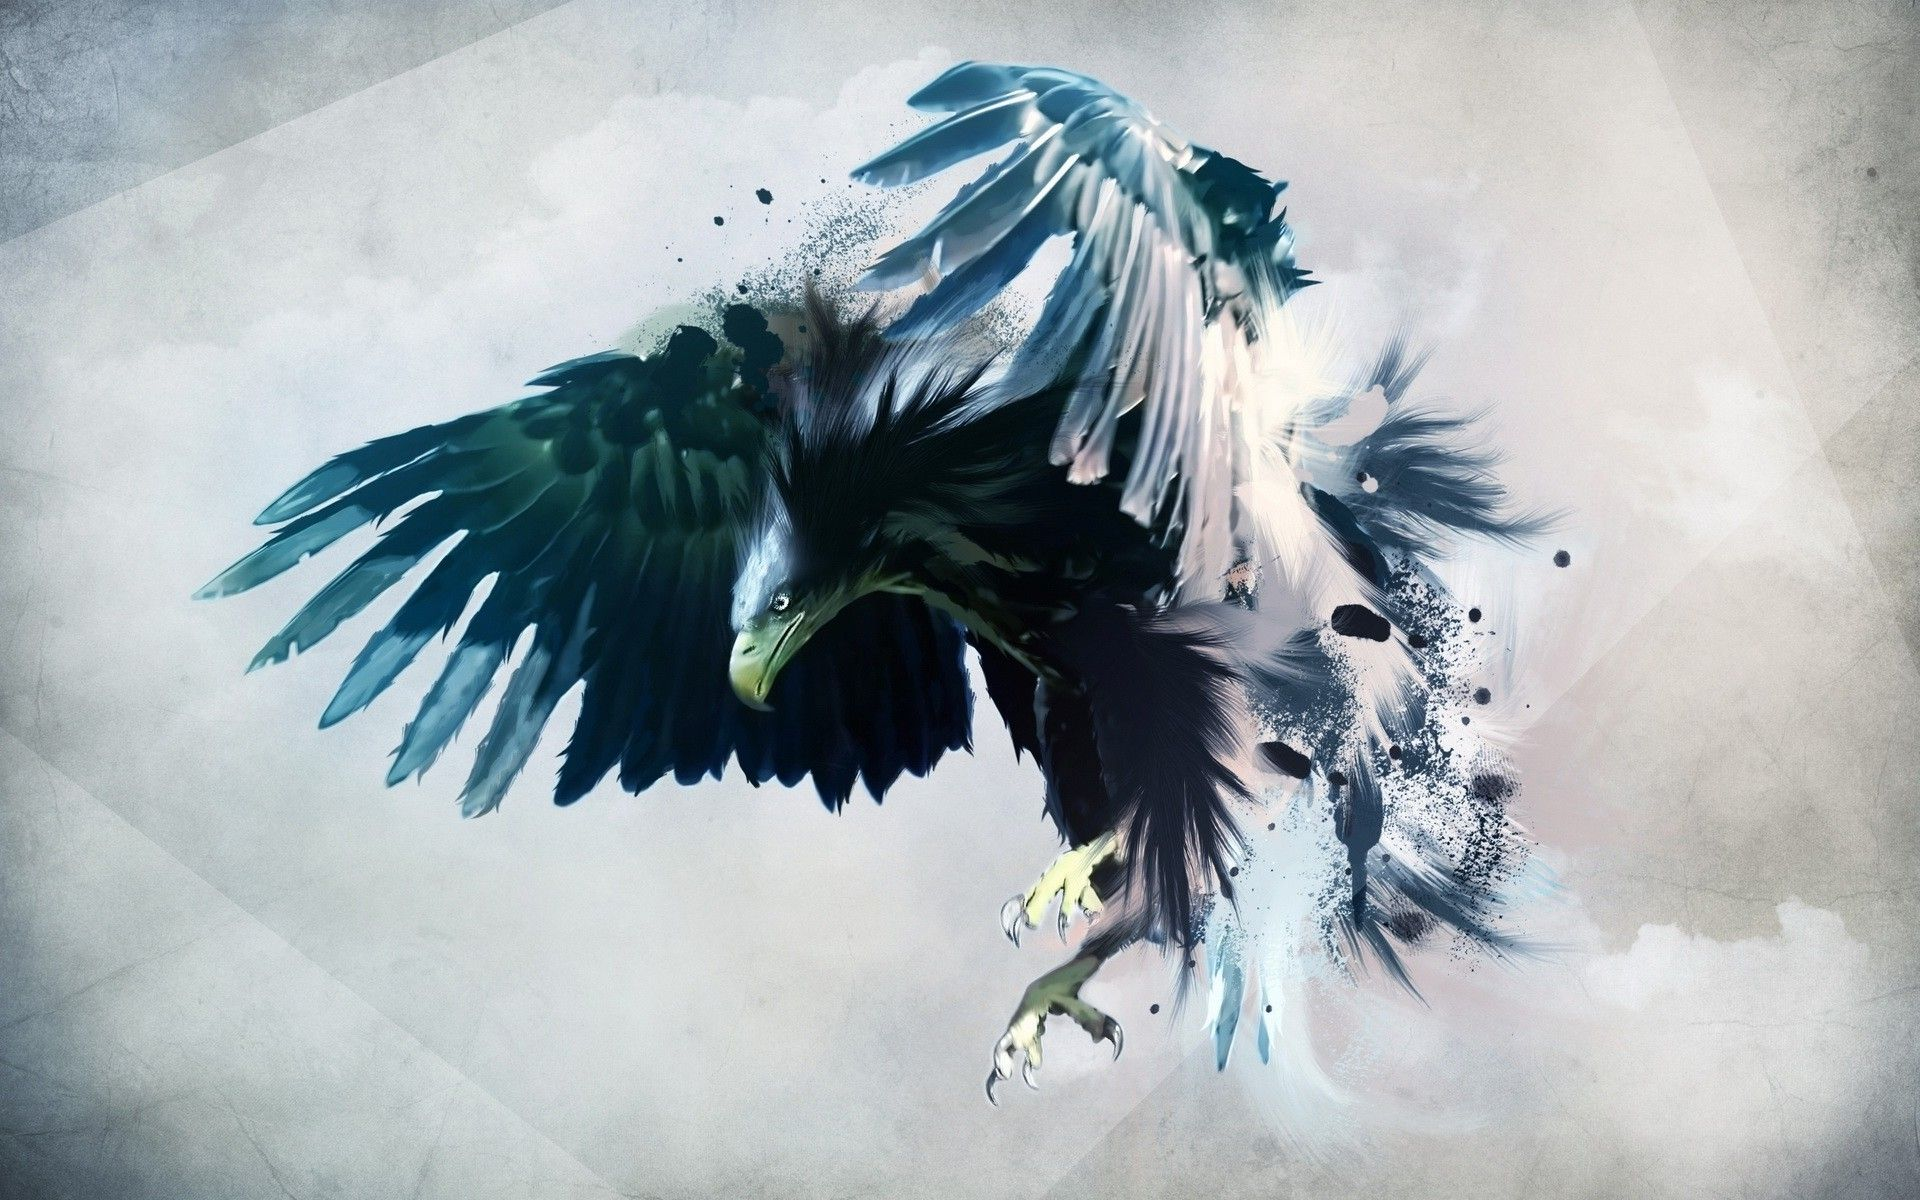 Hd wallpaper eagle - Bald Eagle Hd Wallpapers Backgrounds Wallpaper